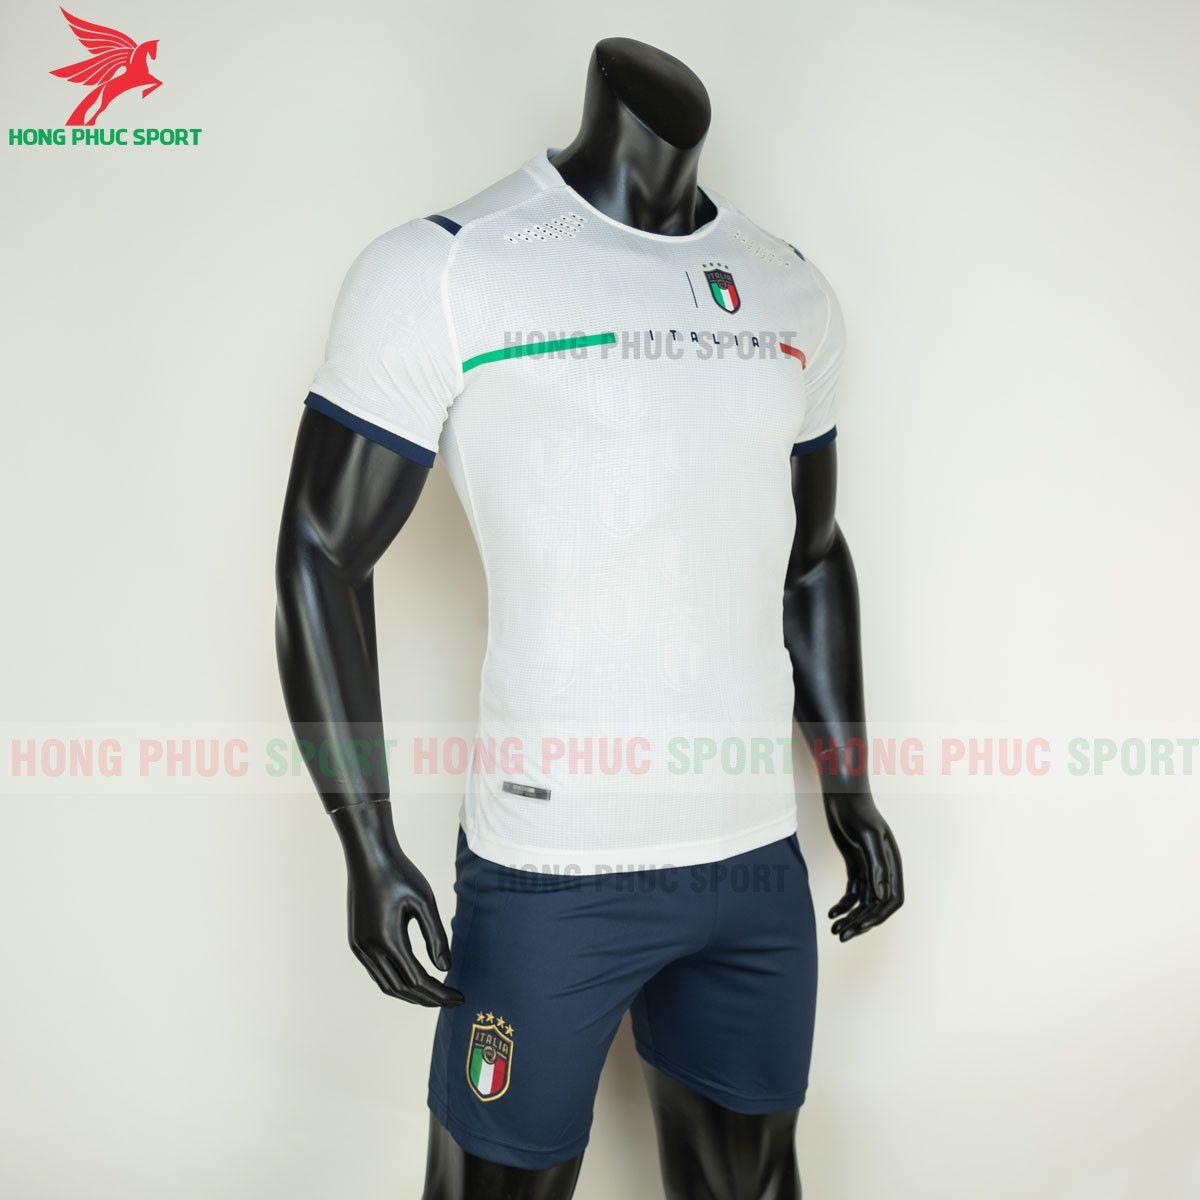 https://cdn.hongphucsport.com/unsafe/s4.shopbay.vn/files/285/ao-bong-da-tuyen-italia-2021-san-khach-hang-thai-6-60d2ff054328b.jpg